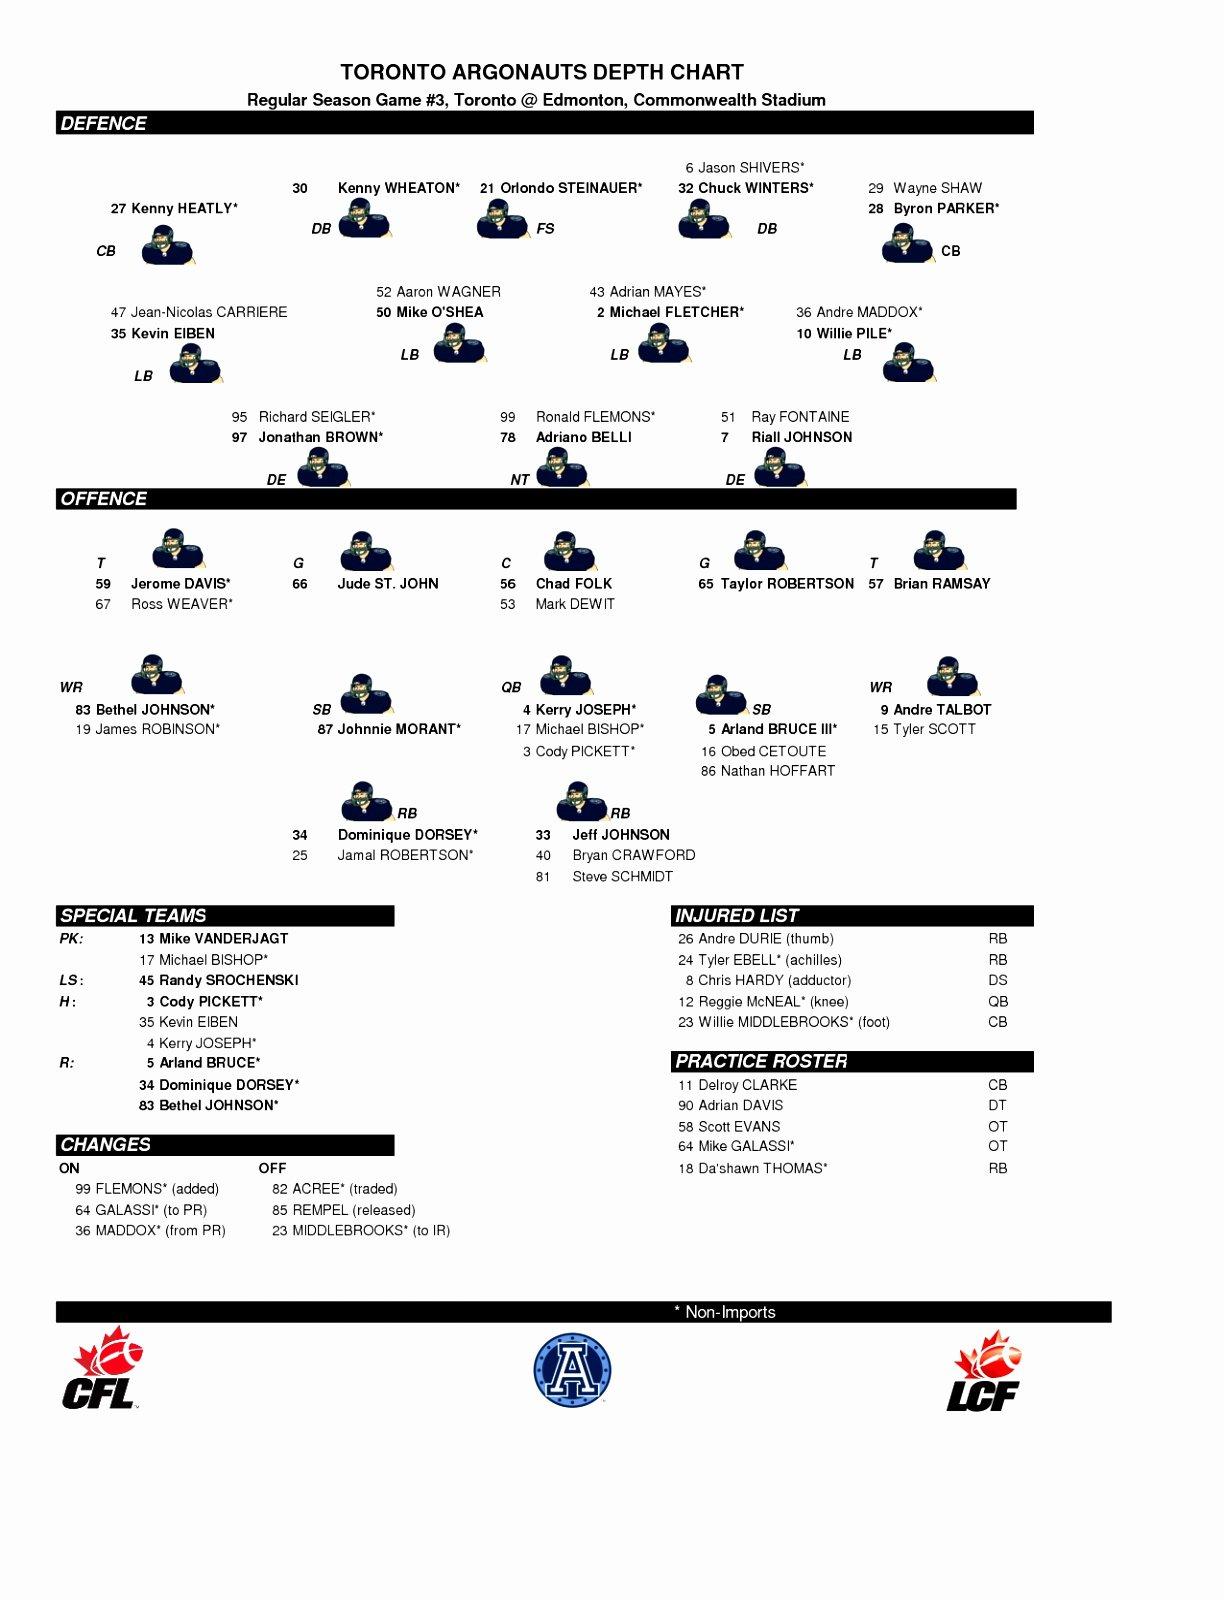 Football Depth Chart Template Excel Beautiful 5 Printable Football Depth Chart Template Yaouu